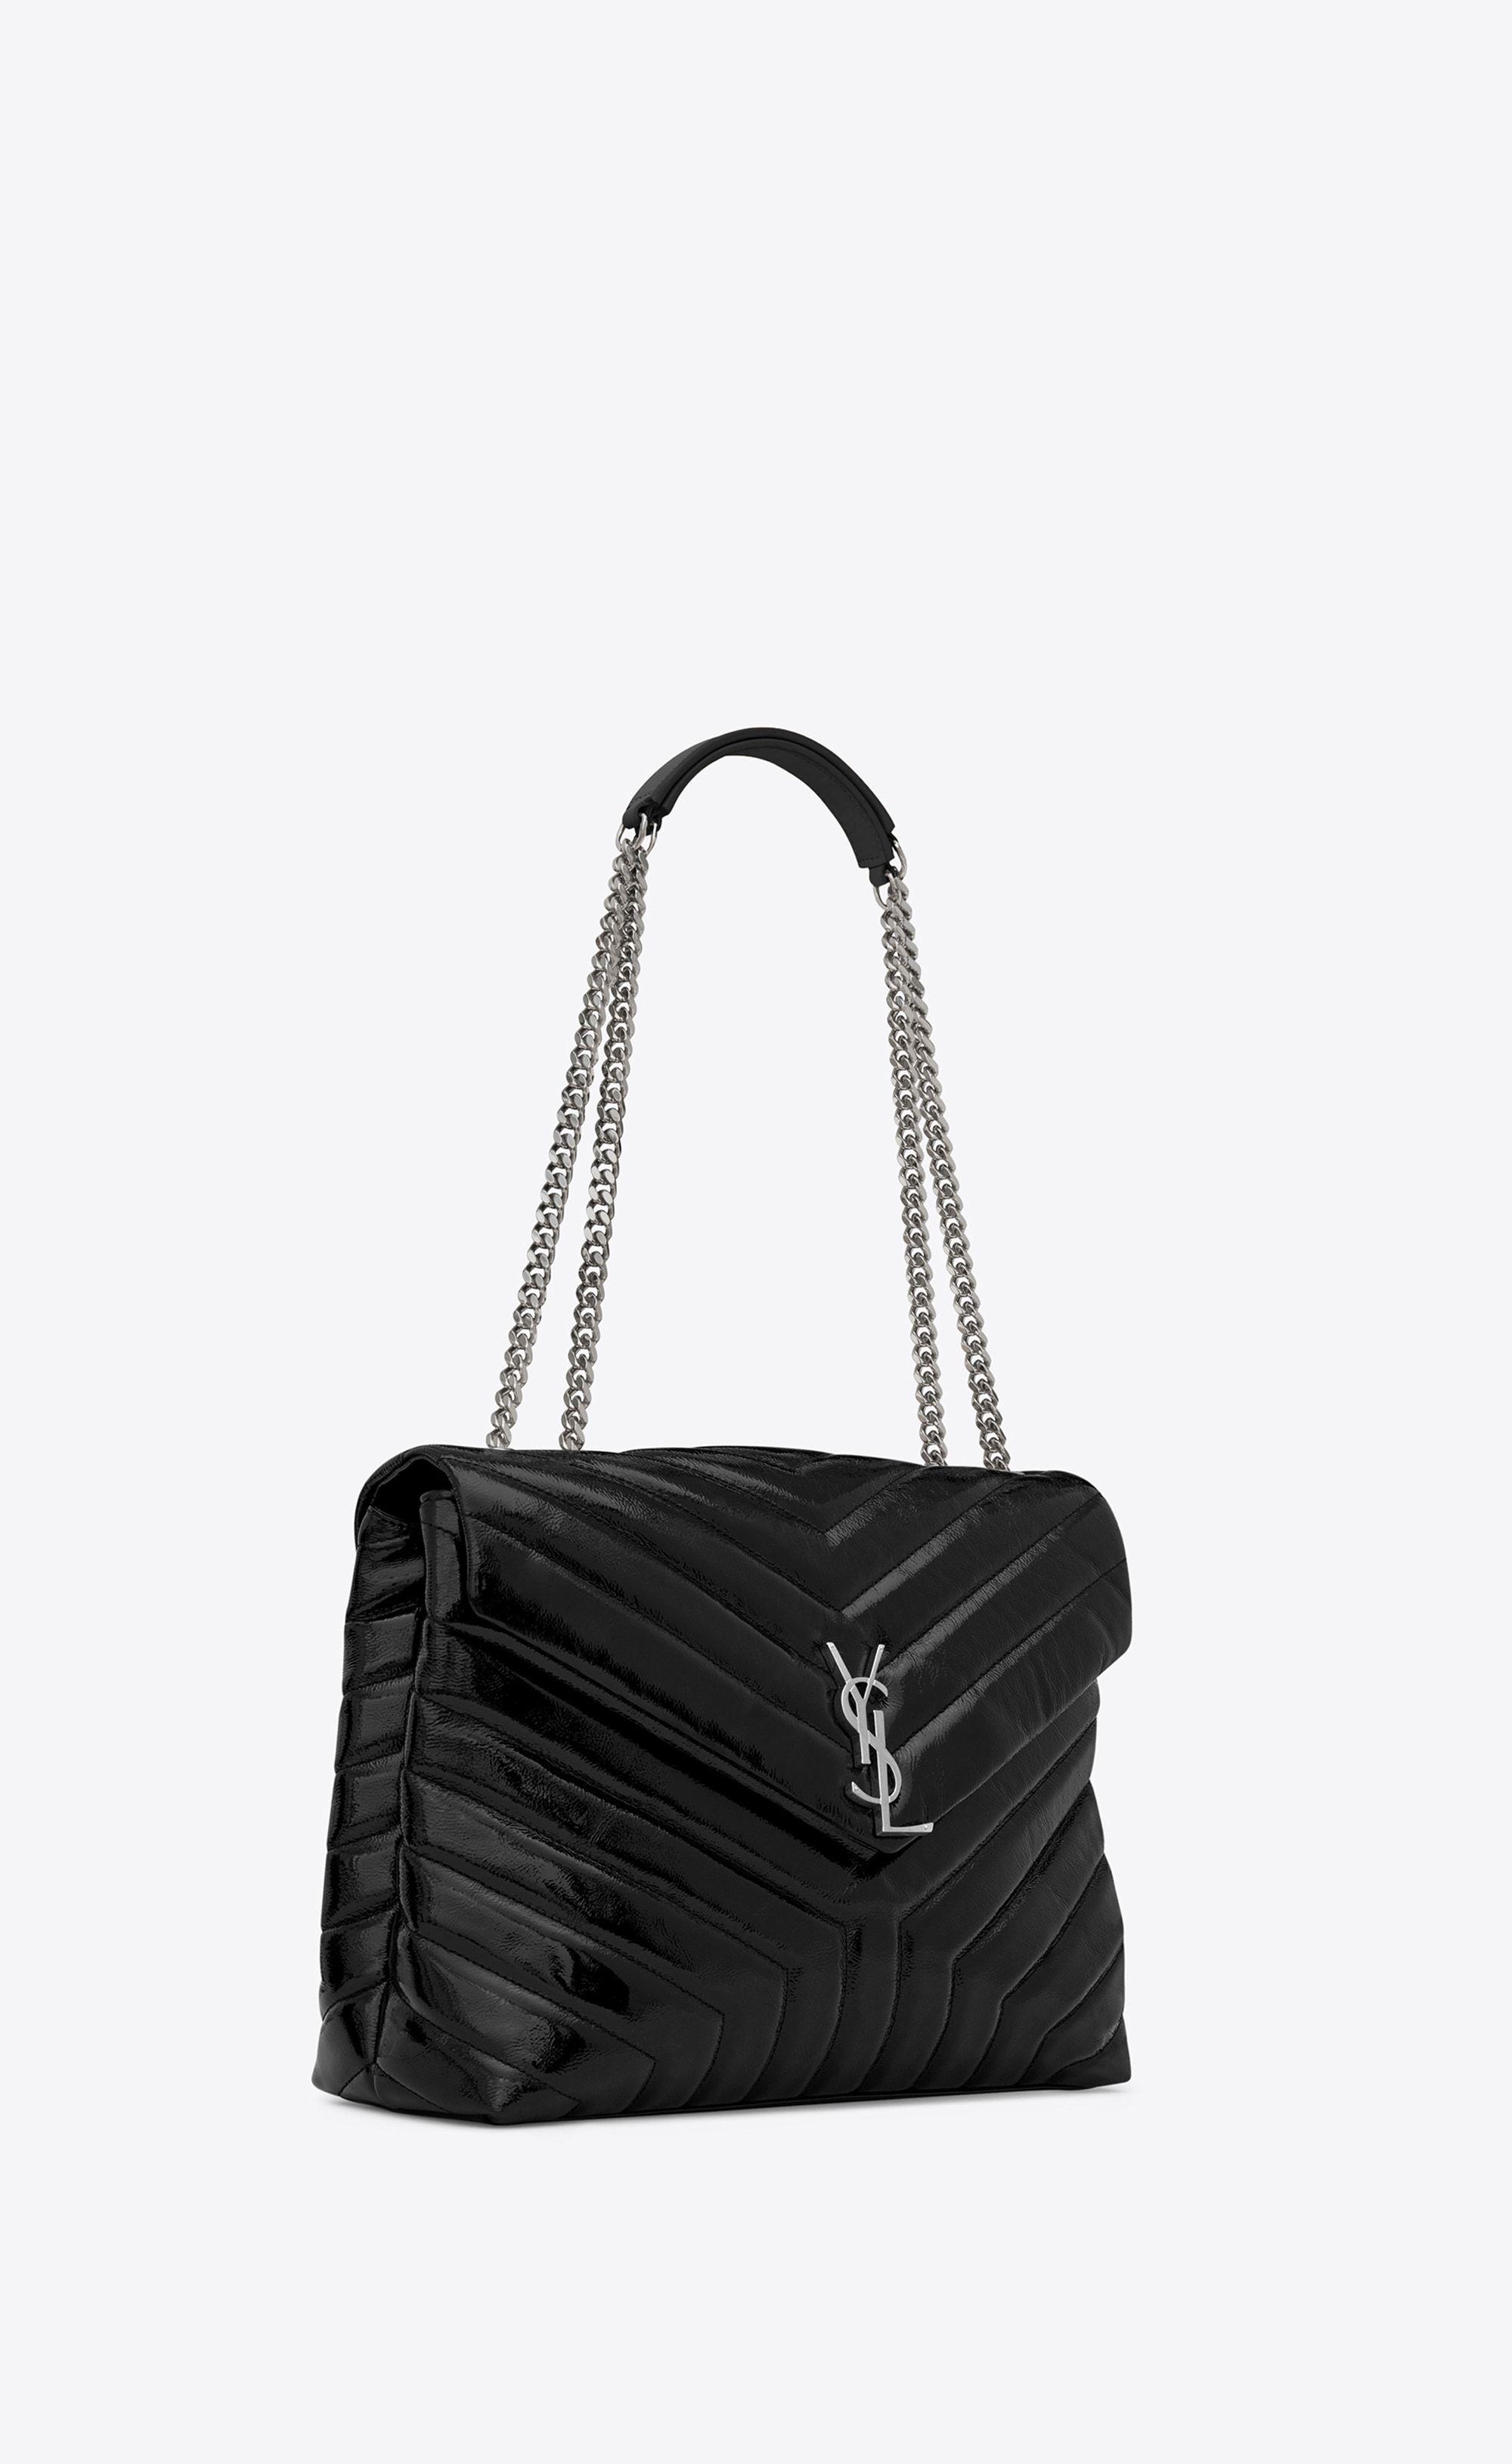 7651e359bf Saint Laurent - Medium Loulou chain bag in black